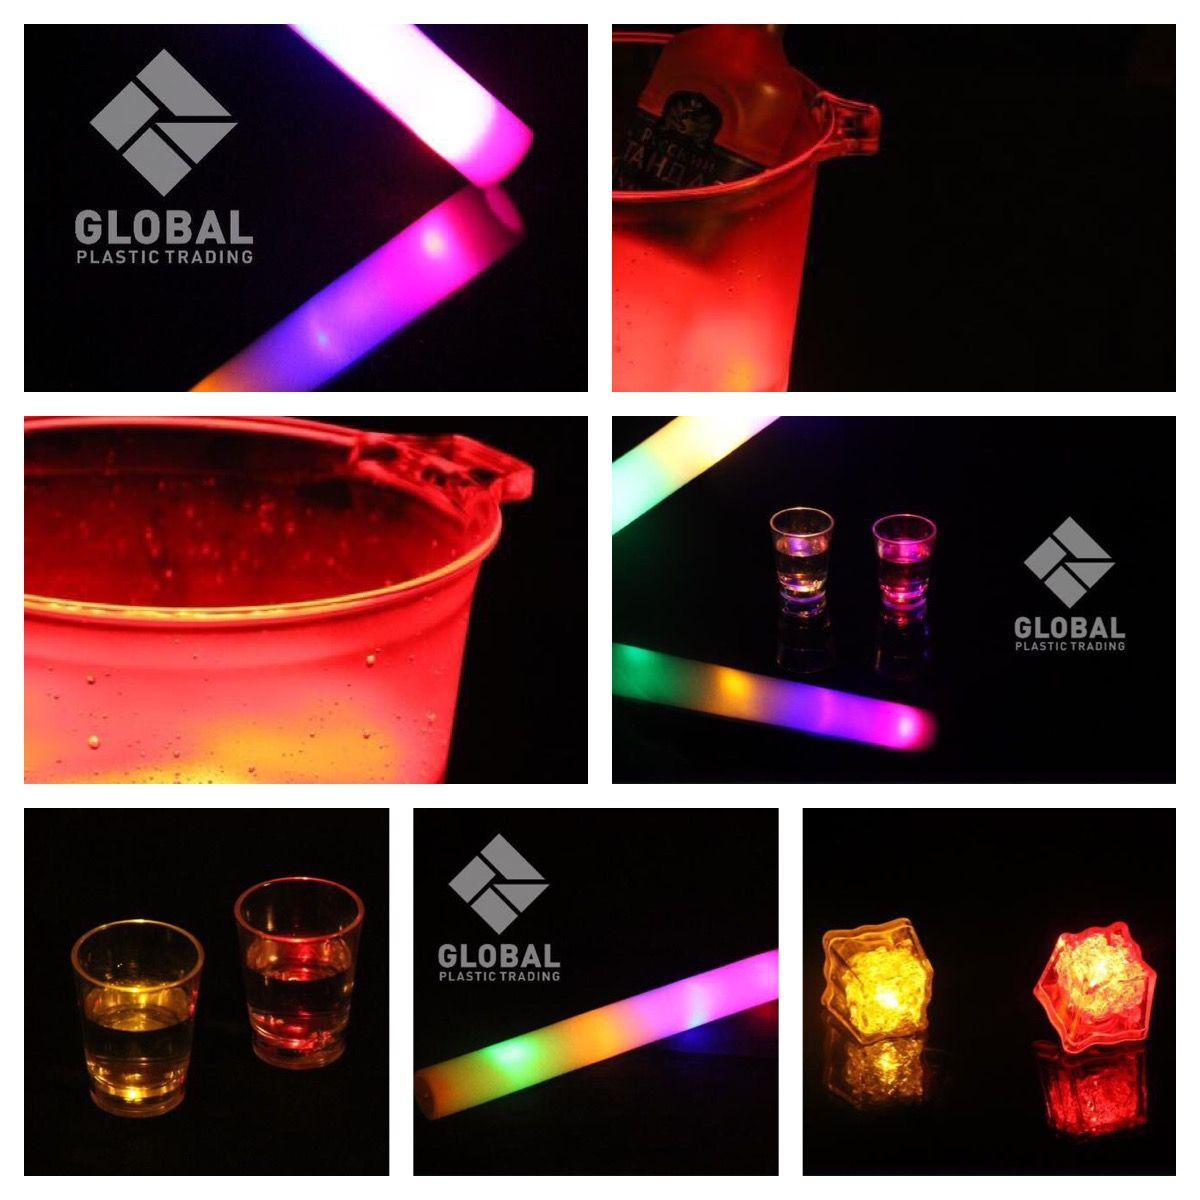 Productos Neon - lleva u juerga a ooooootro level ;)